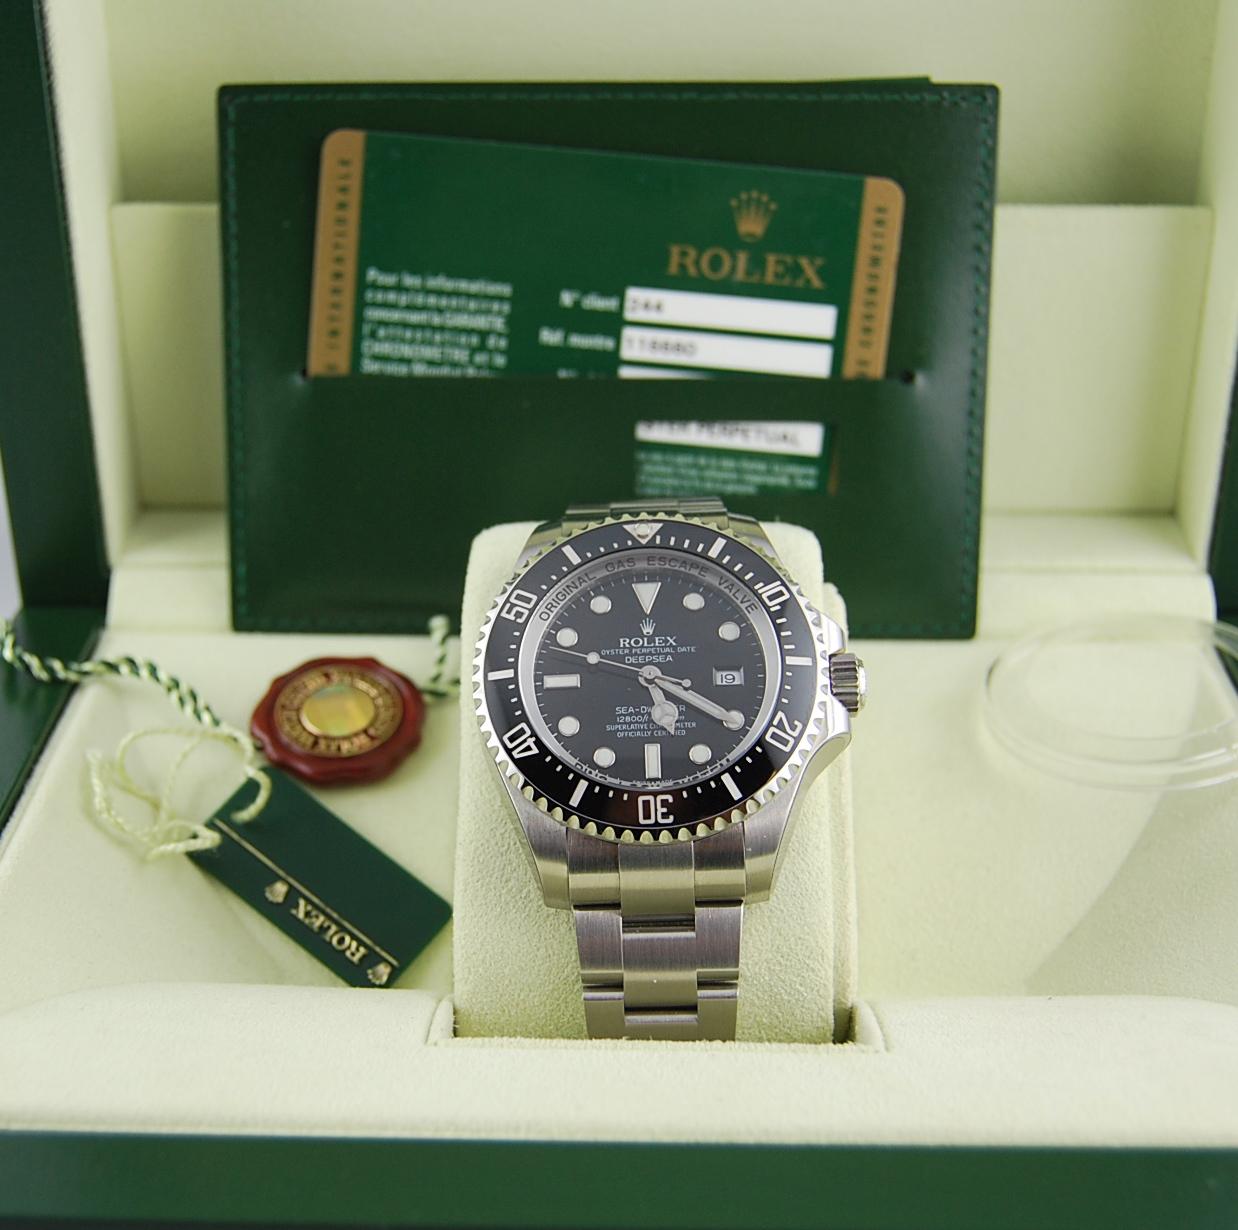 Rolex Sea-Dweller Deepsea 116660 N.O.S New